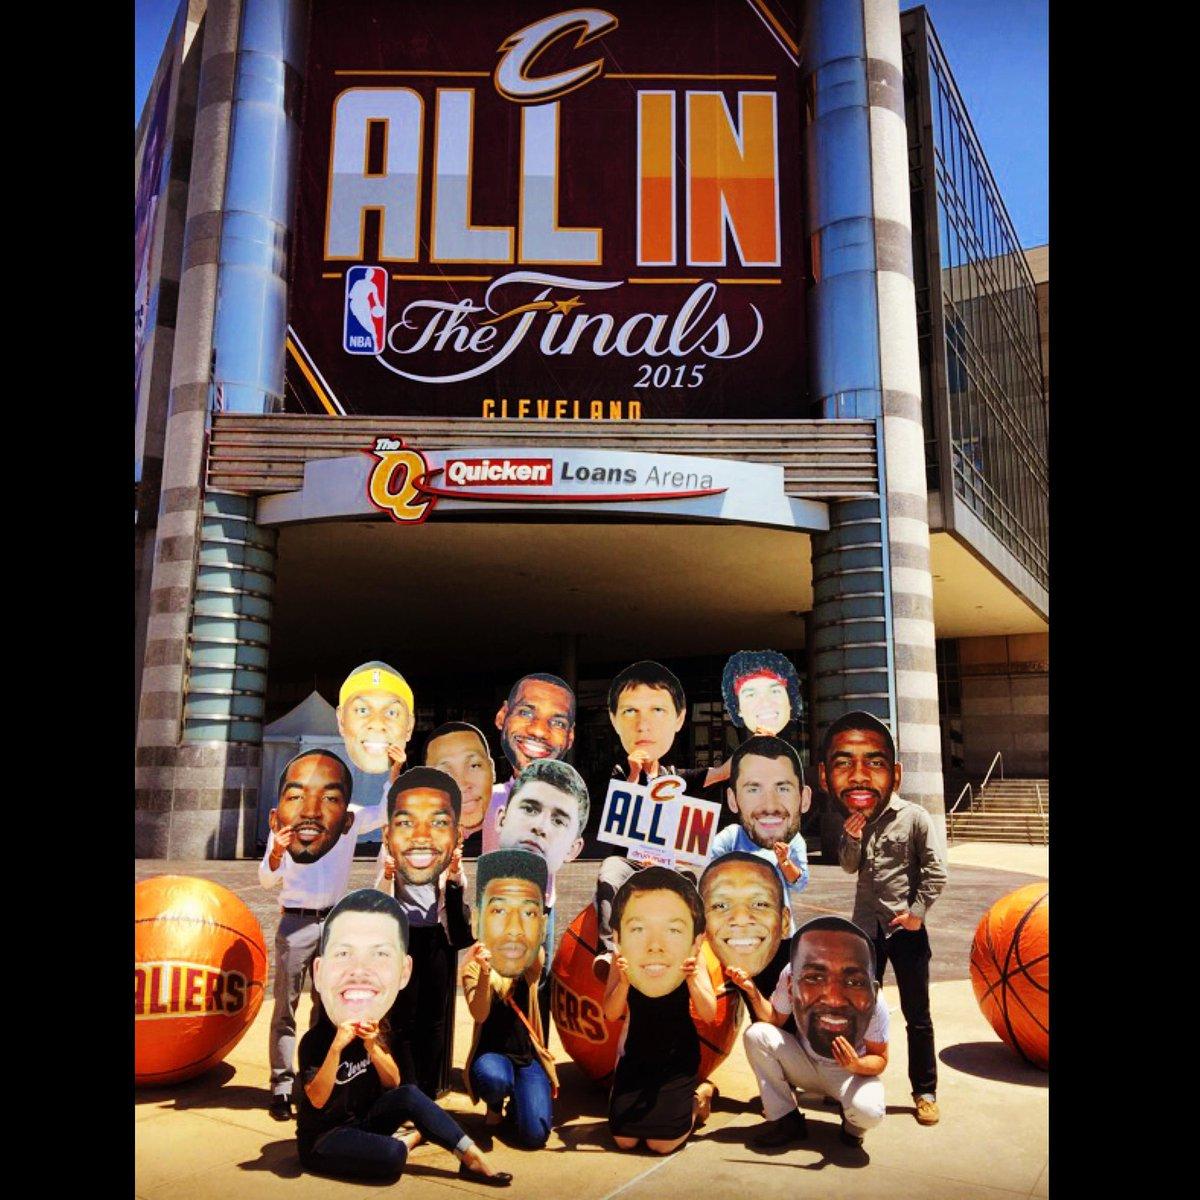 Let's go @cavs! #NBA #NBAFinals #ThisisCLE @NBA #TheLand http://t.co/SvkjMTc3o4